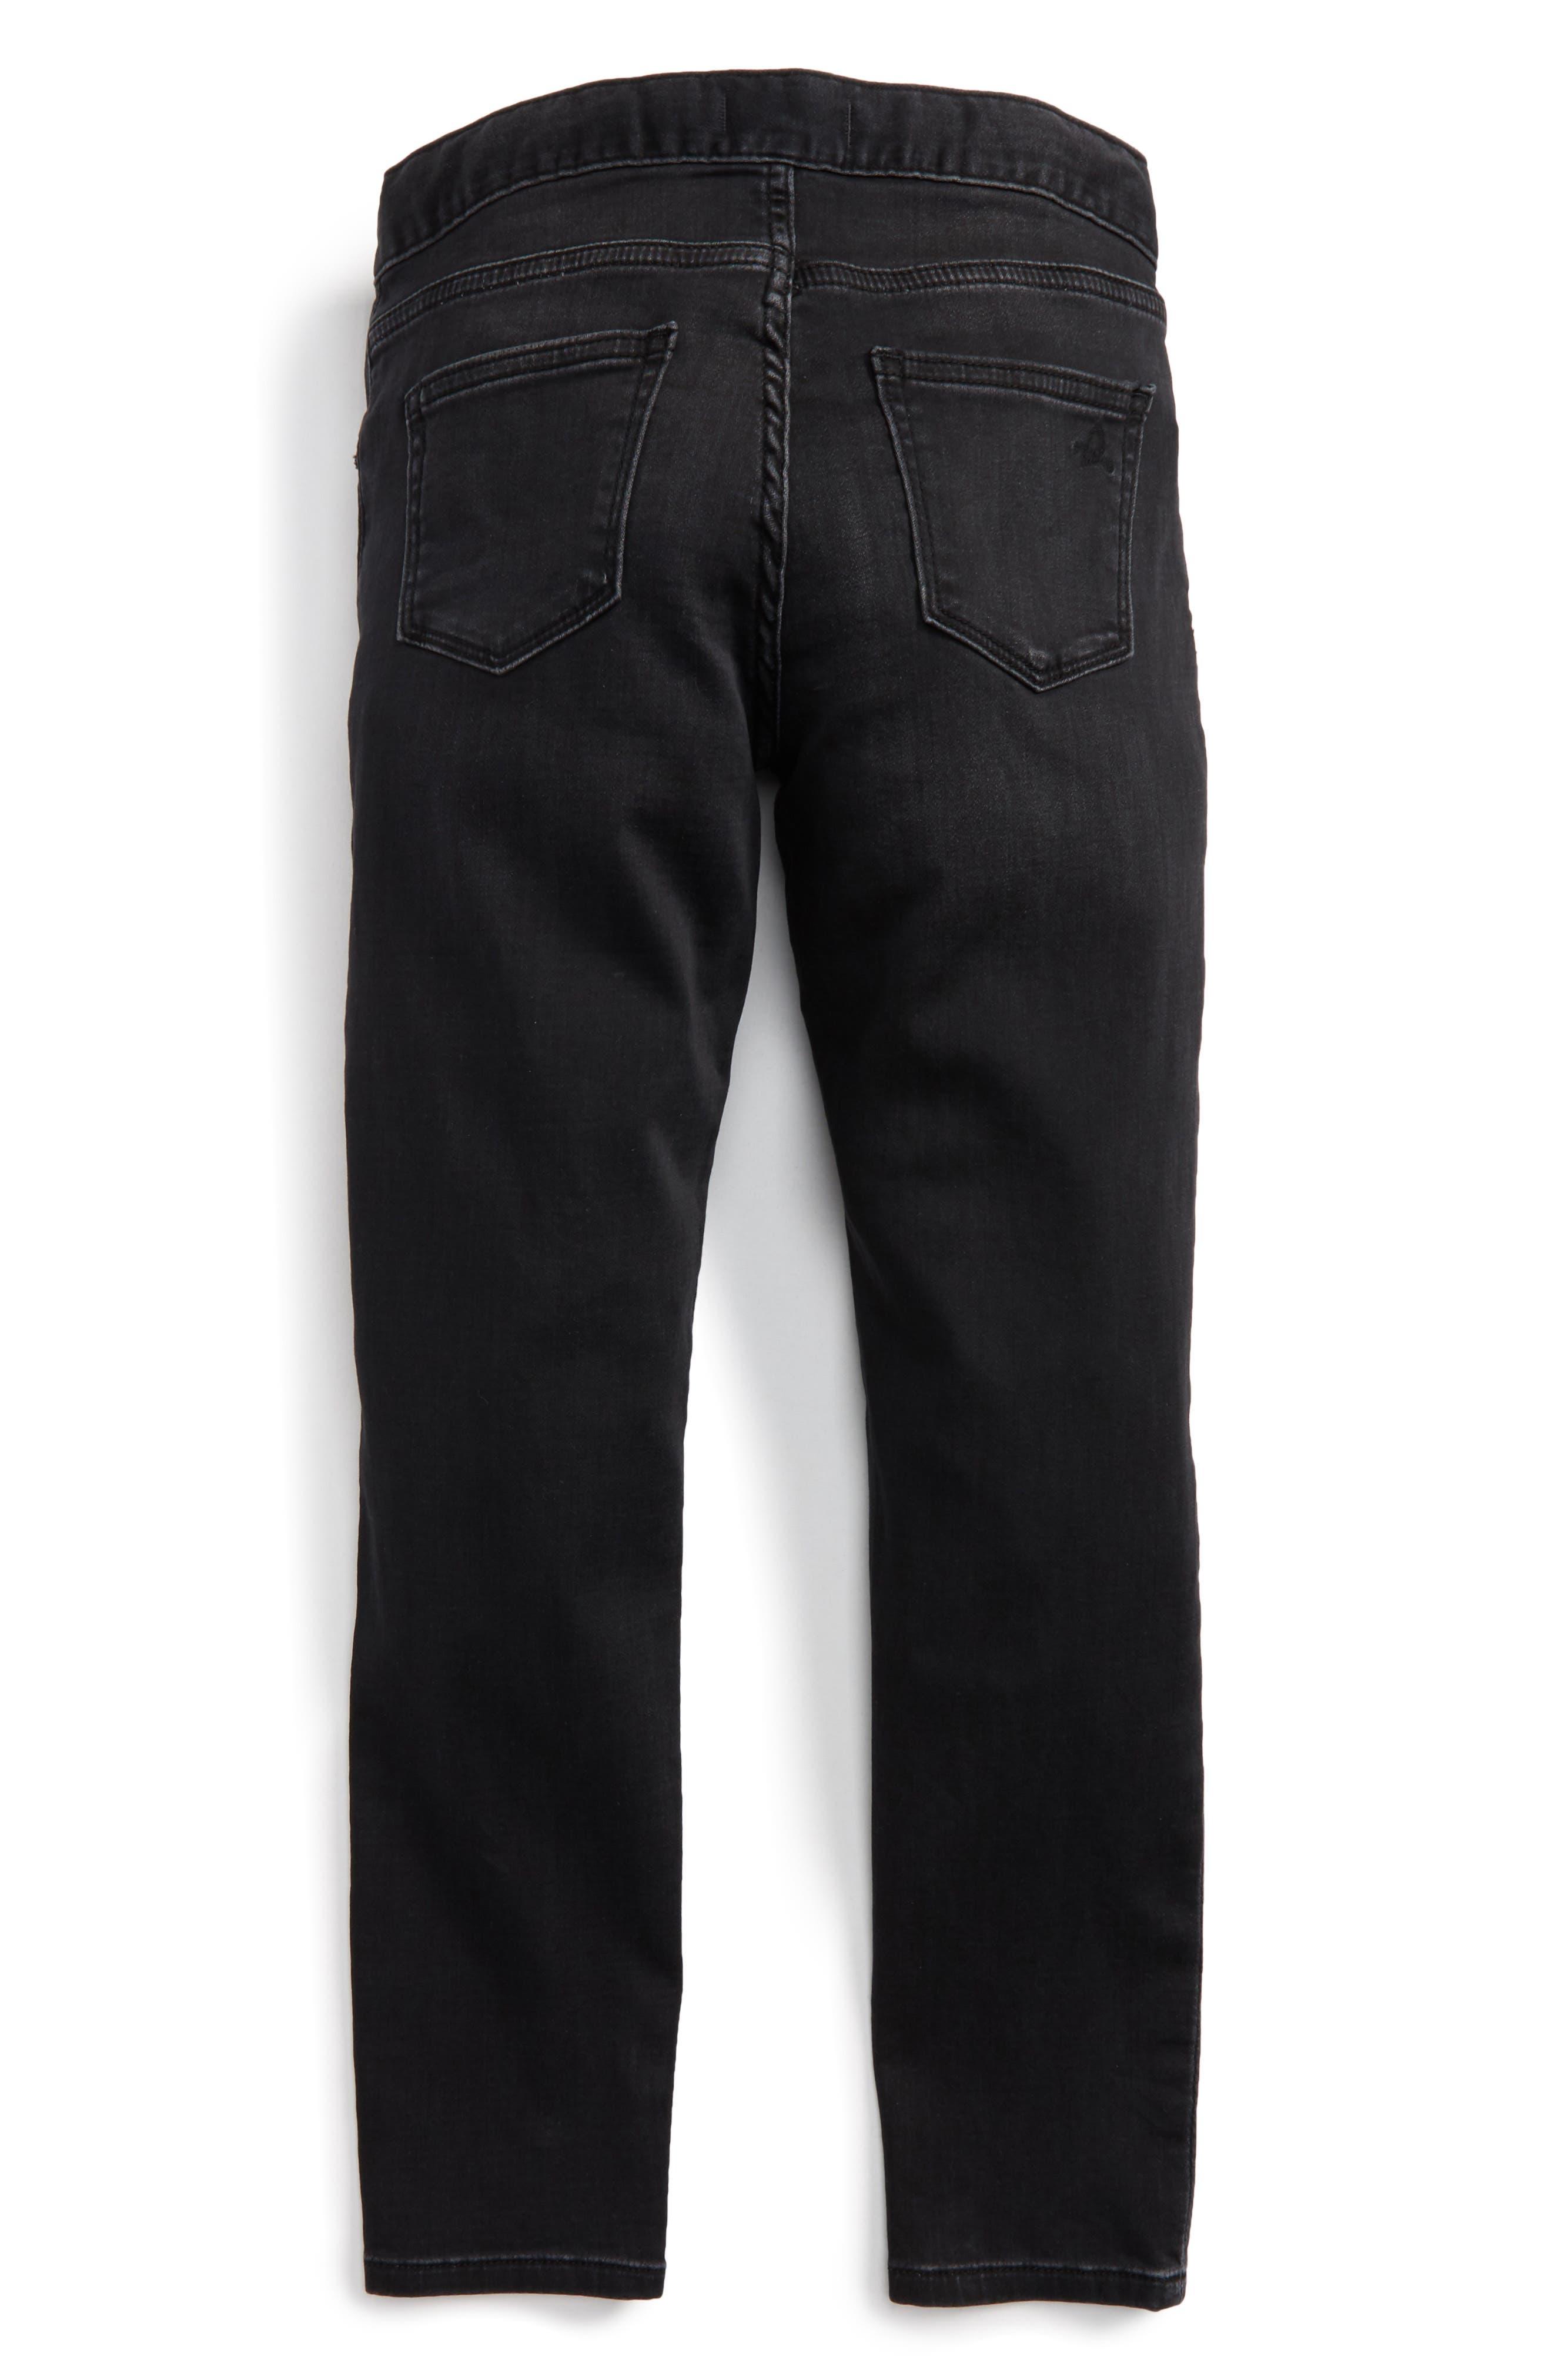 William Straight Leg Jeans,                             Alternate thumbnail 2, color,                             020